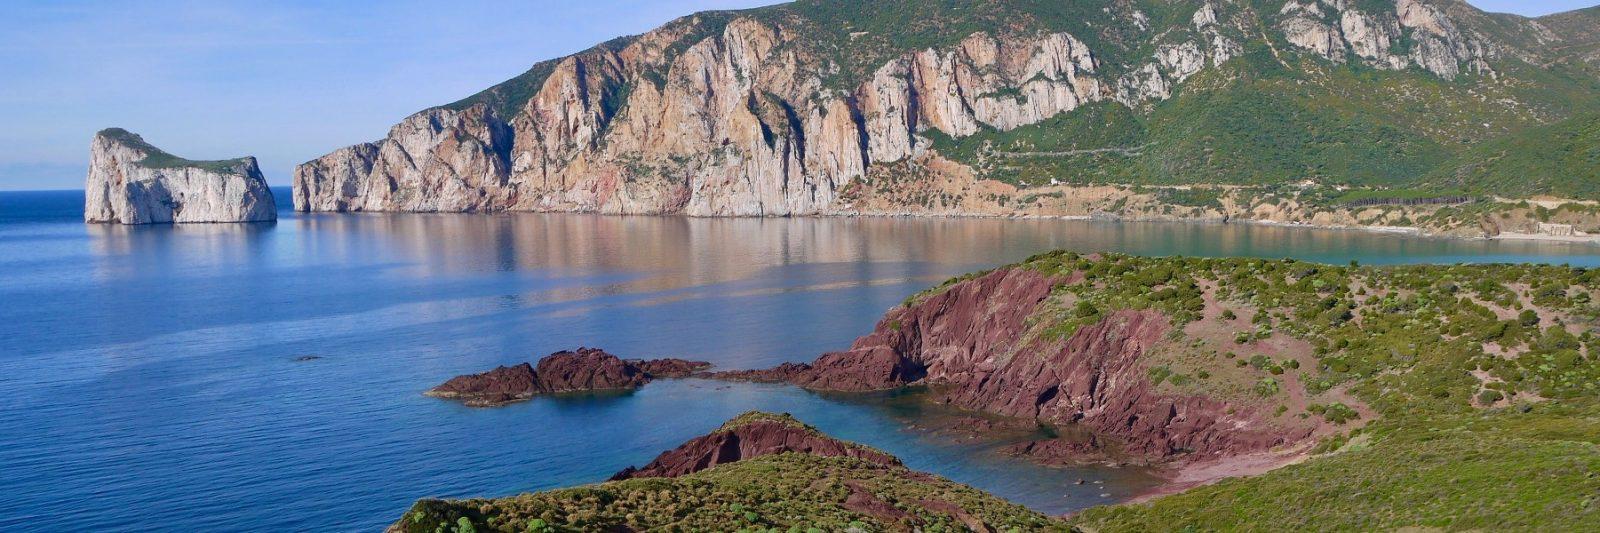 pedra-rubia-best-beaches-sardinia